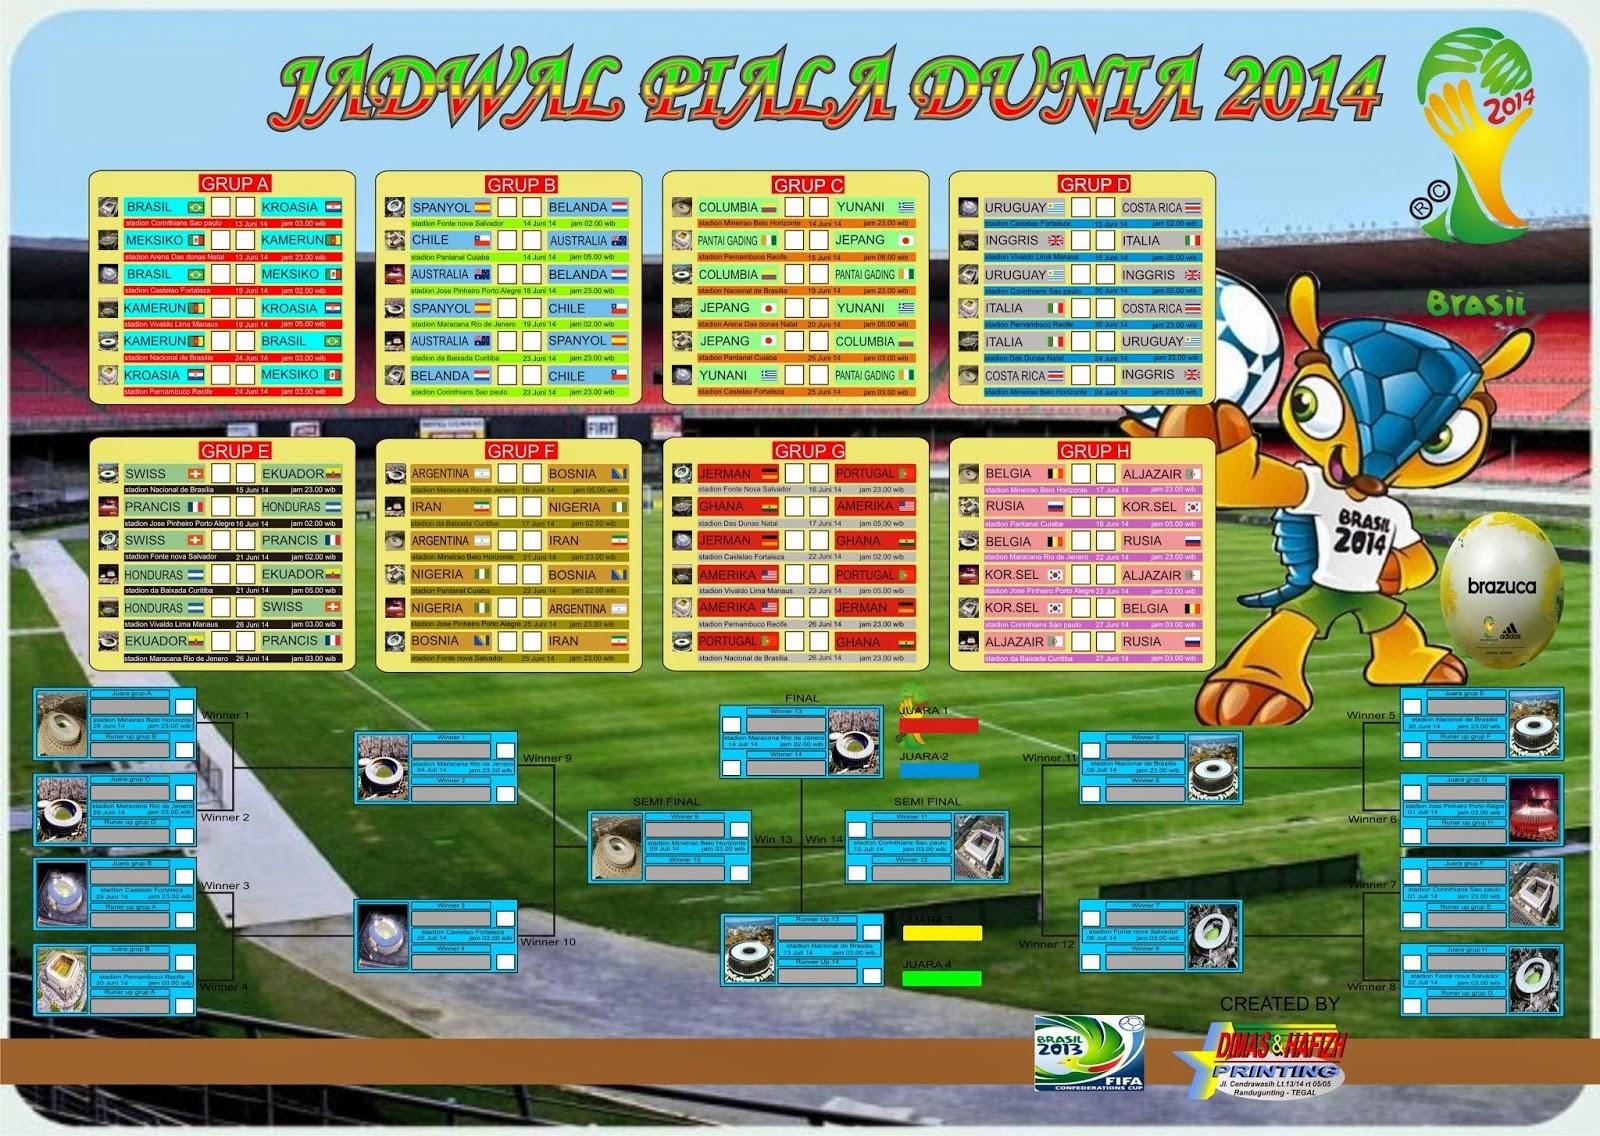 Jadwal Piala Dunia 2014 Waktu Indonesia Barat (WIB)